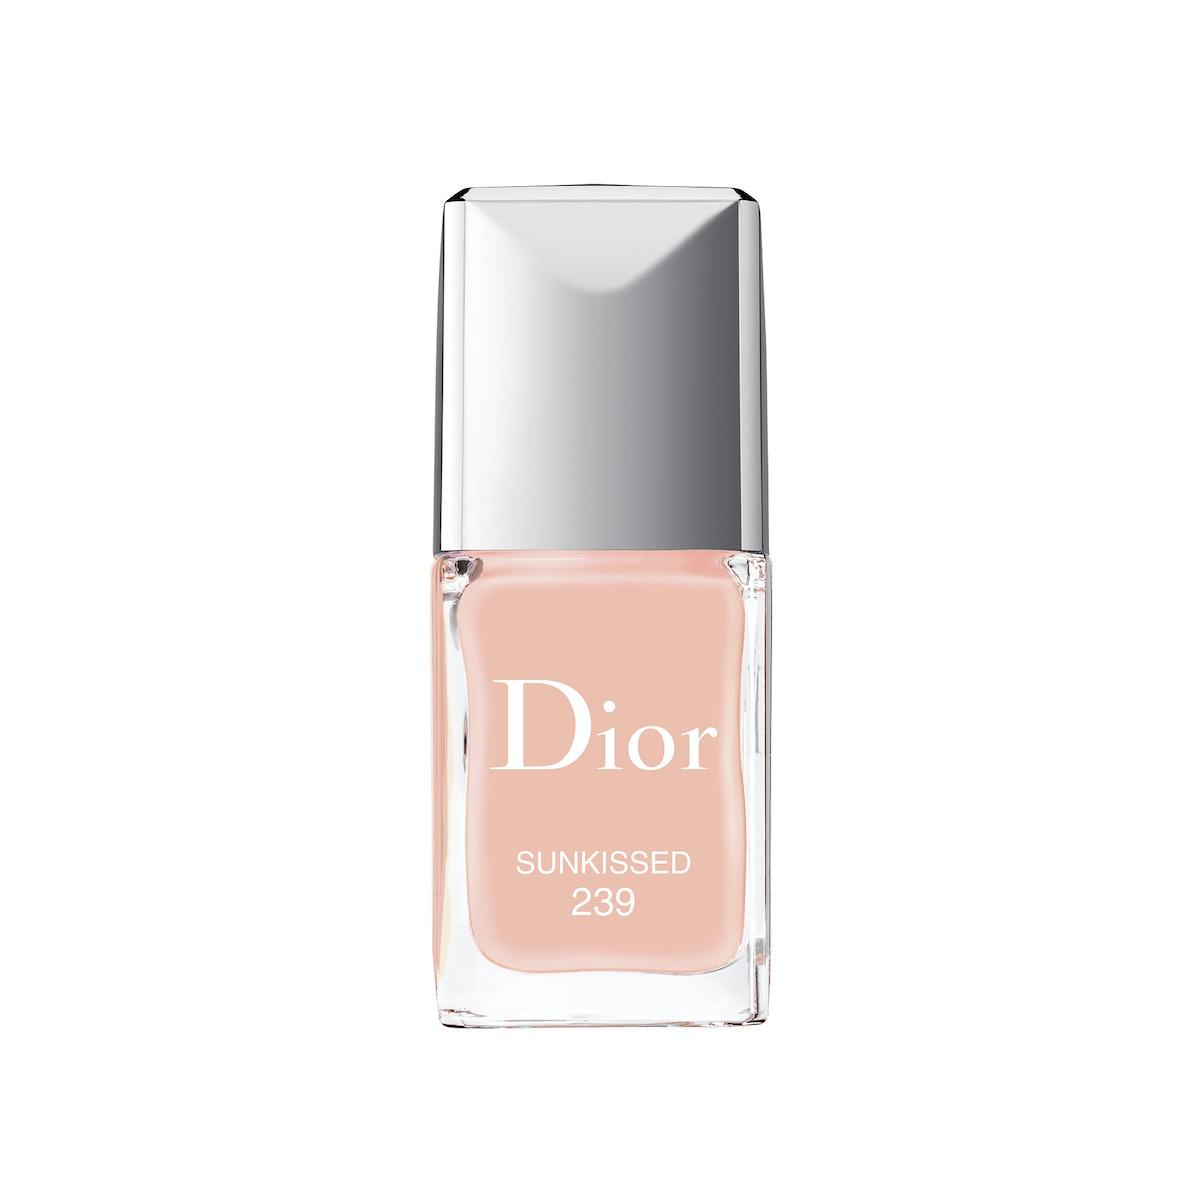 Dior's Sunwashed